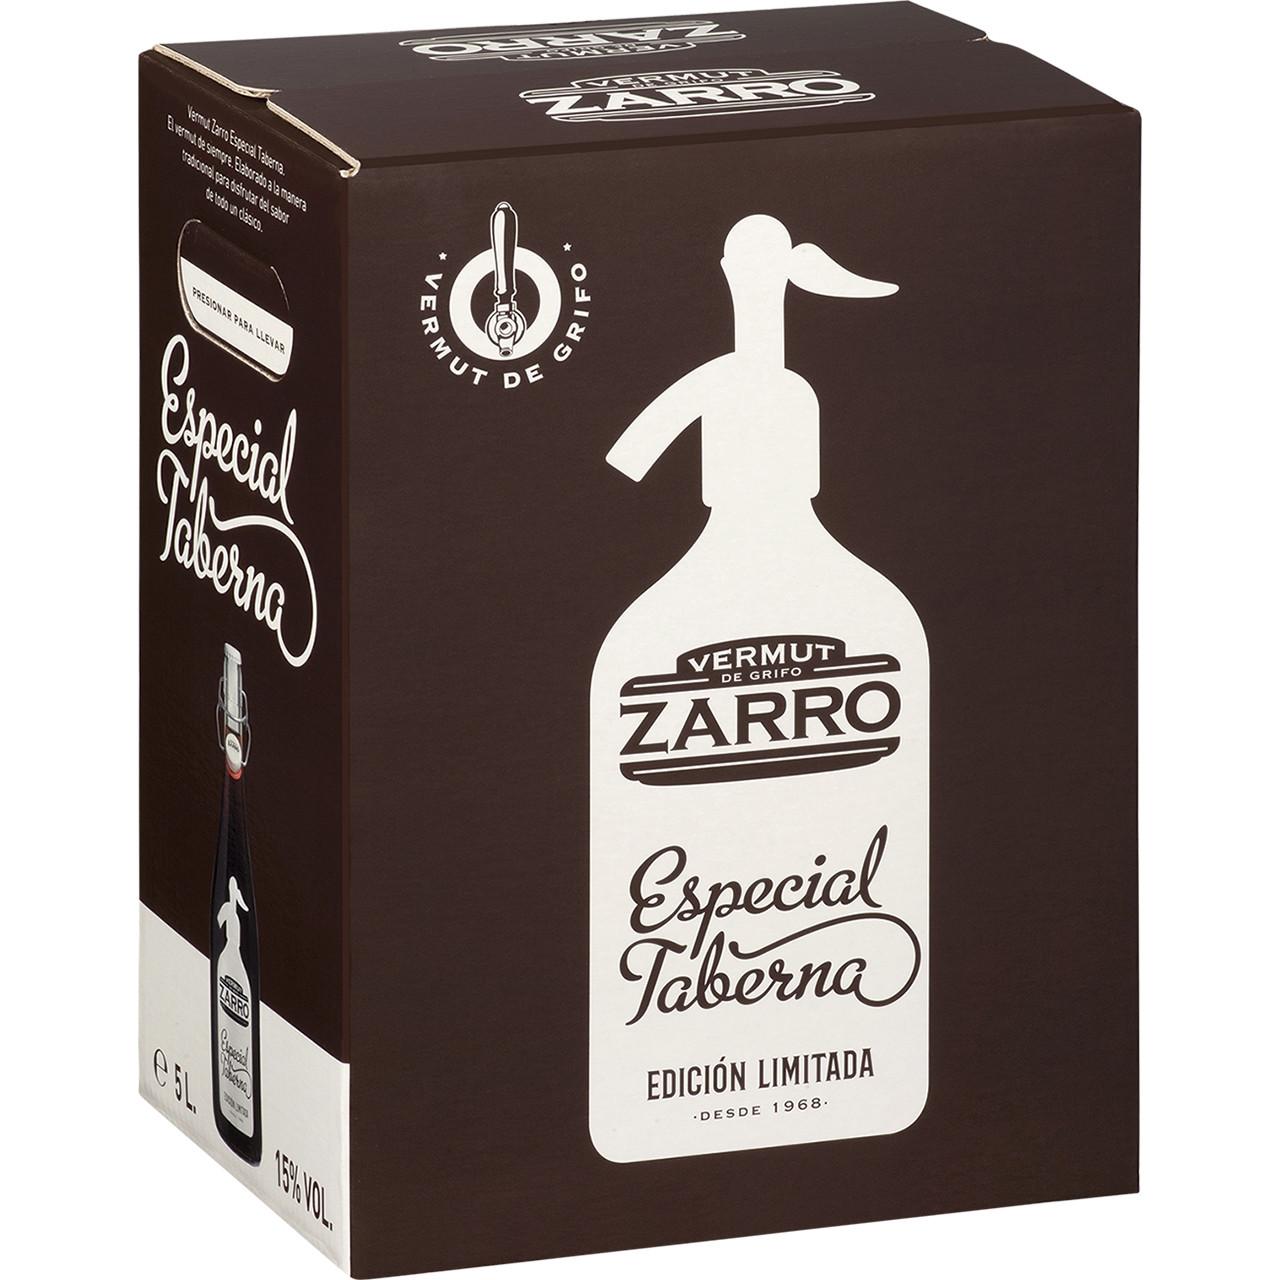 Zarro vermut vermell especial taberna bib